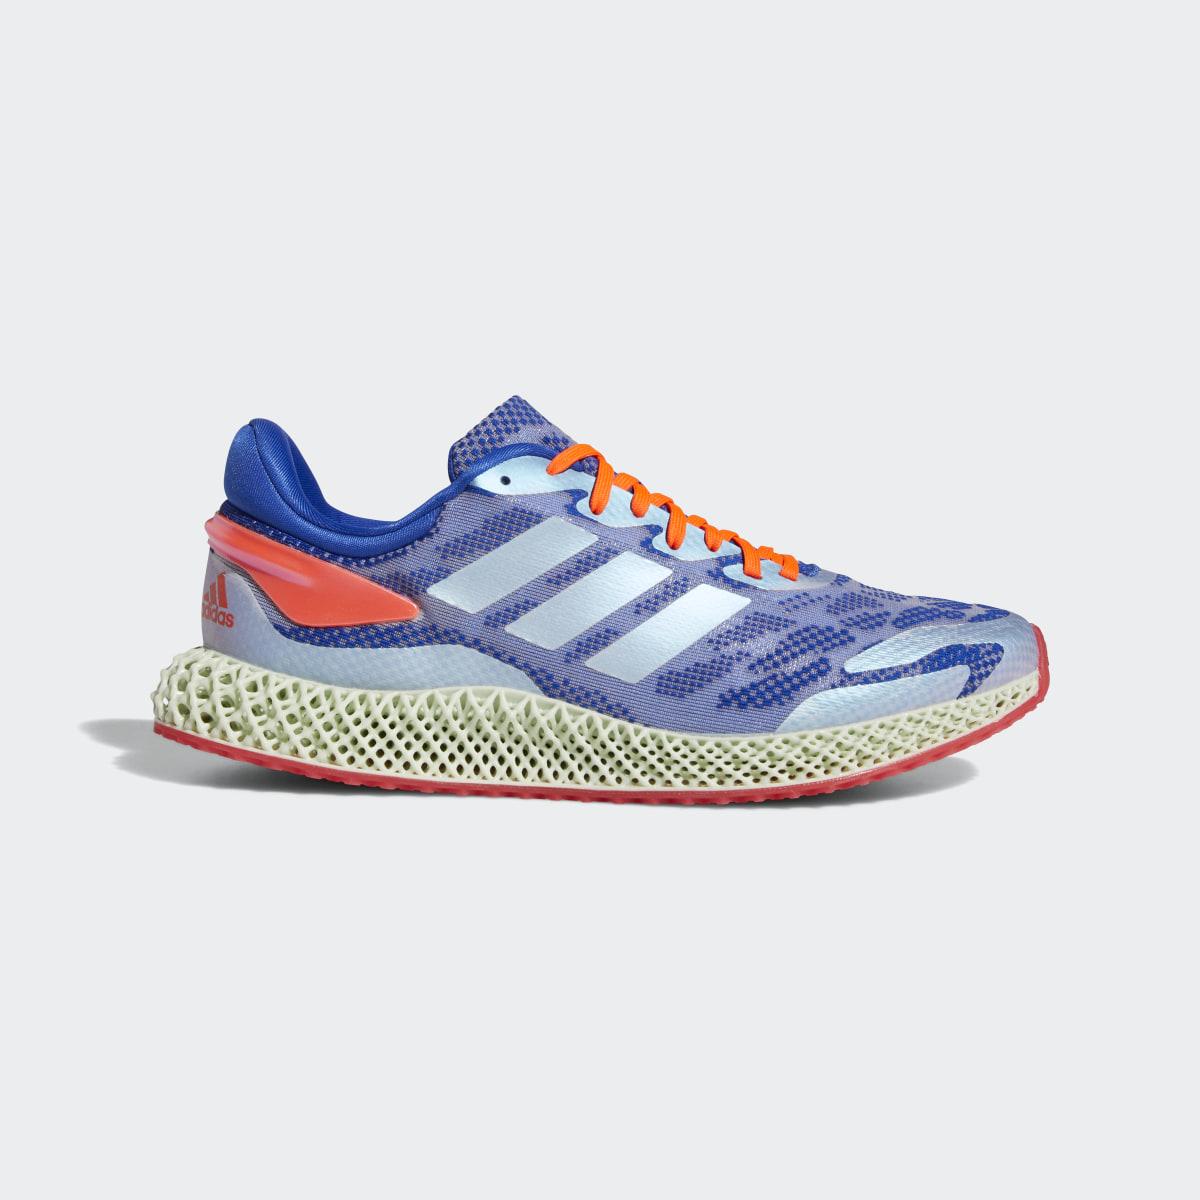 scarpe bambina 10 anni adidas